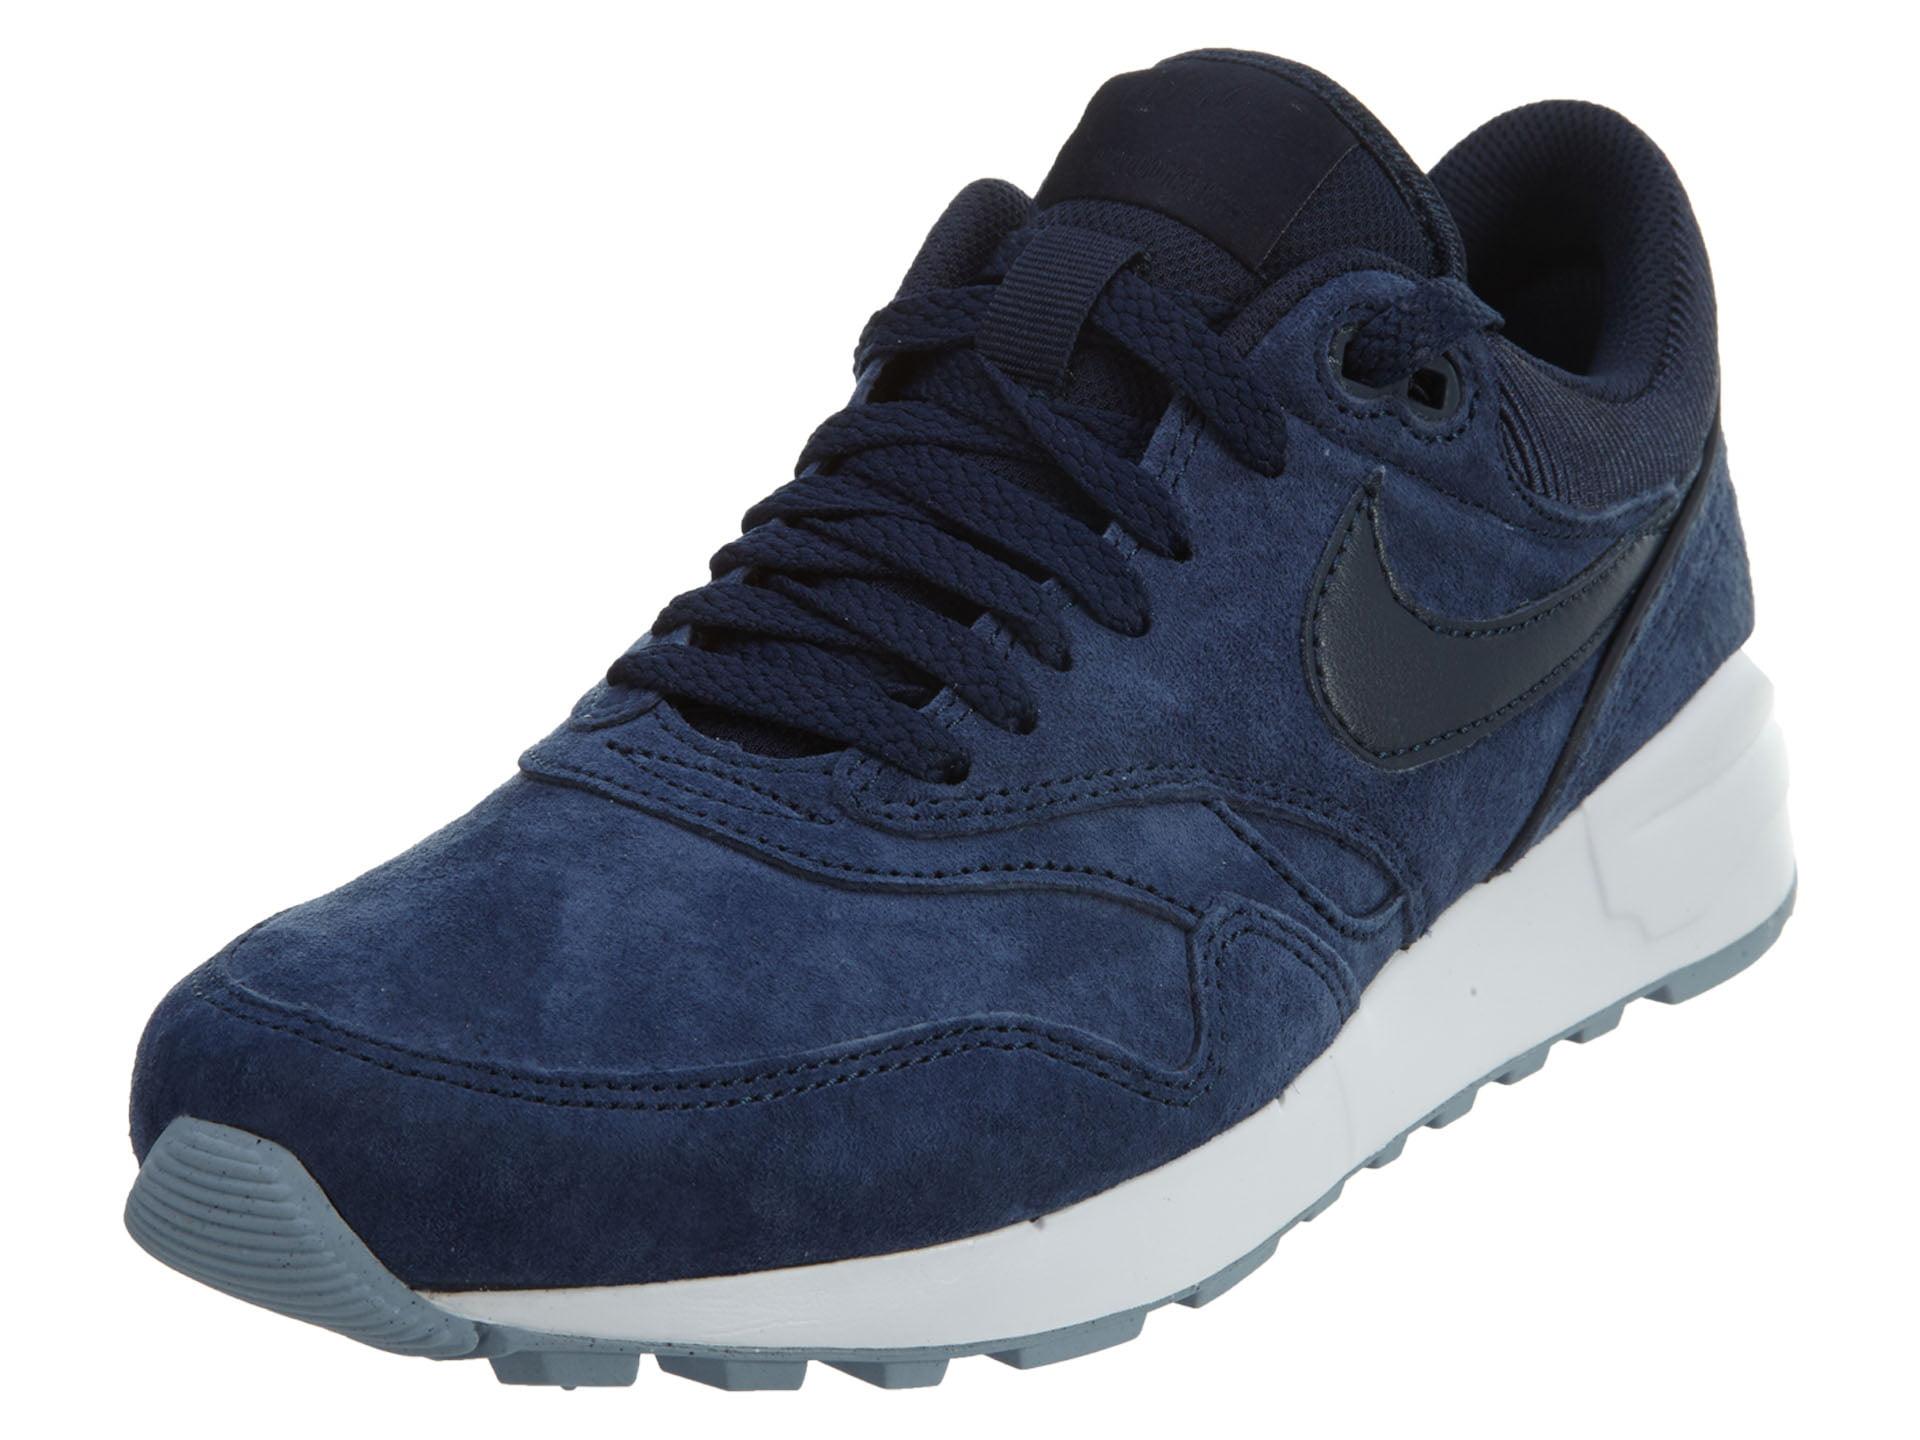 Nike Air Odyssey Prm Mens Style : 806252